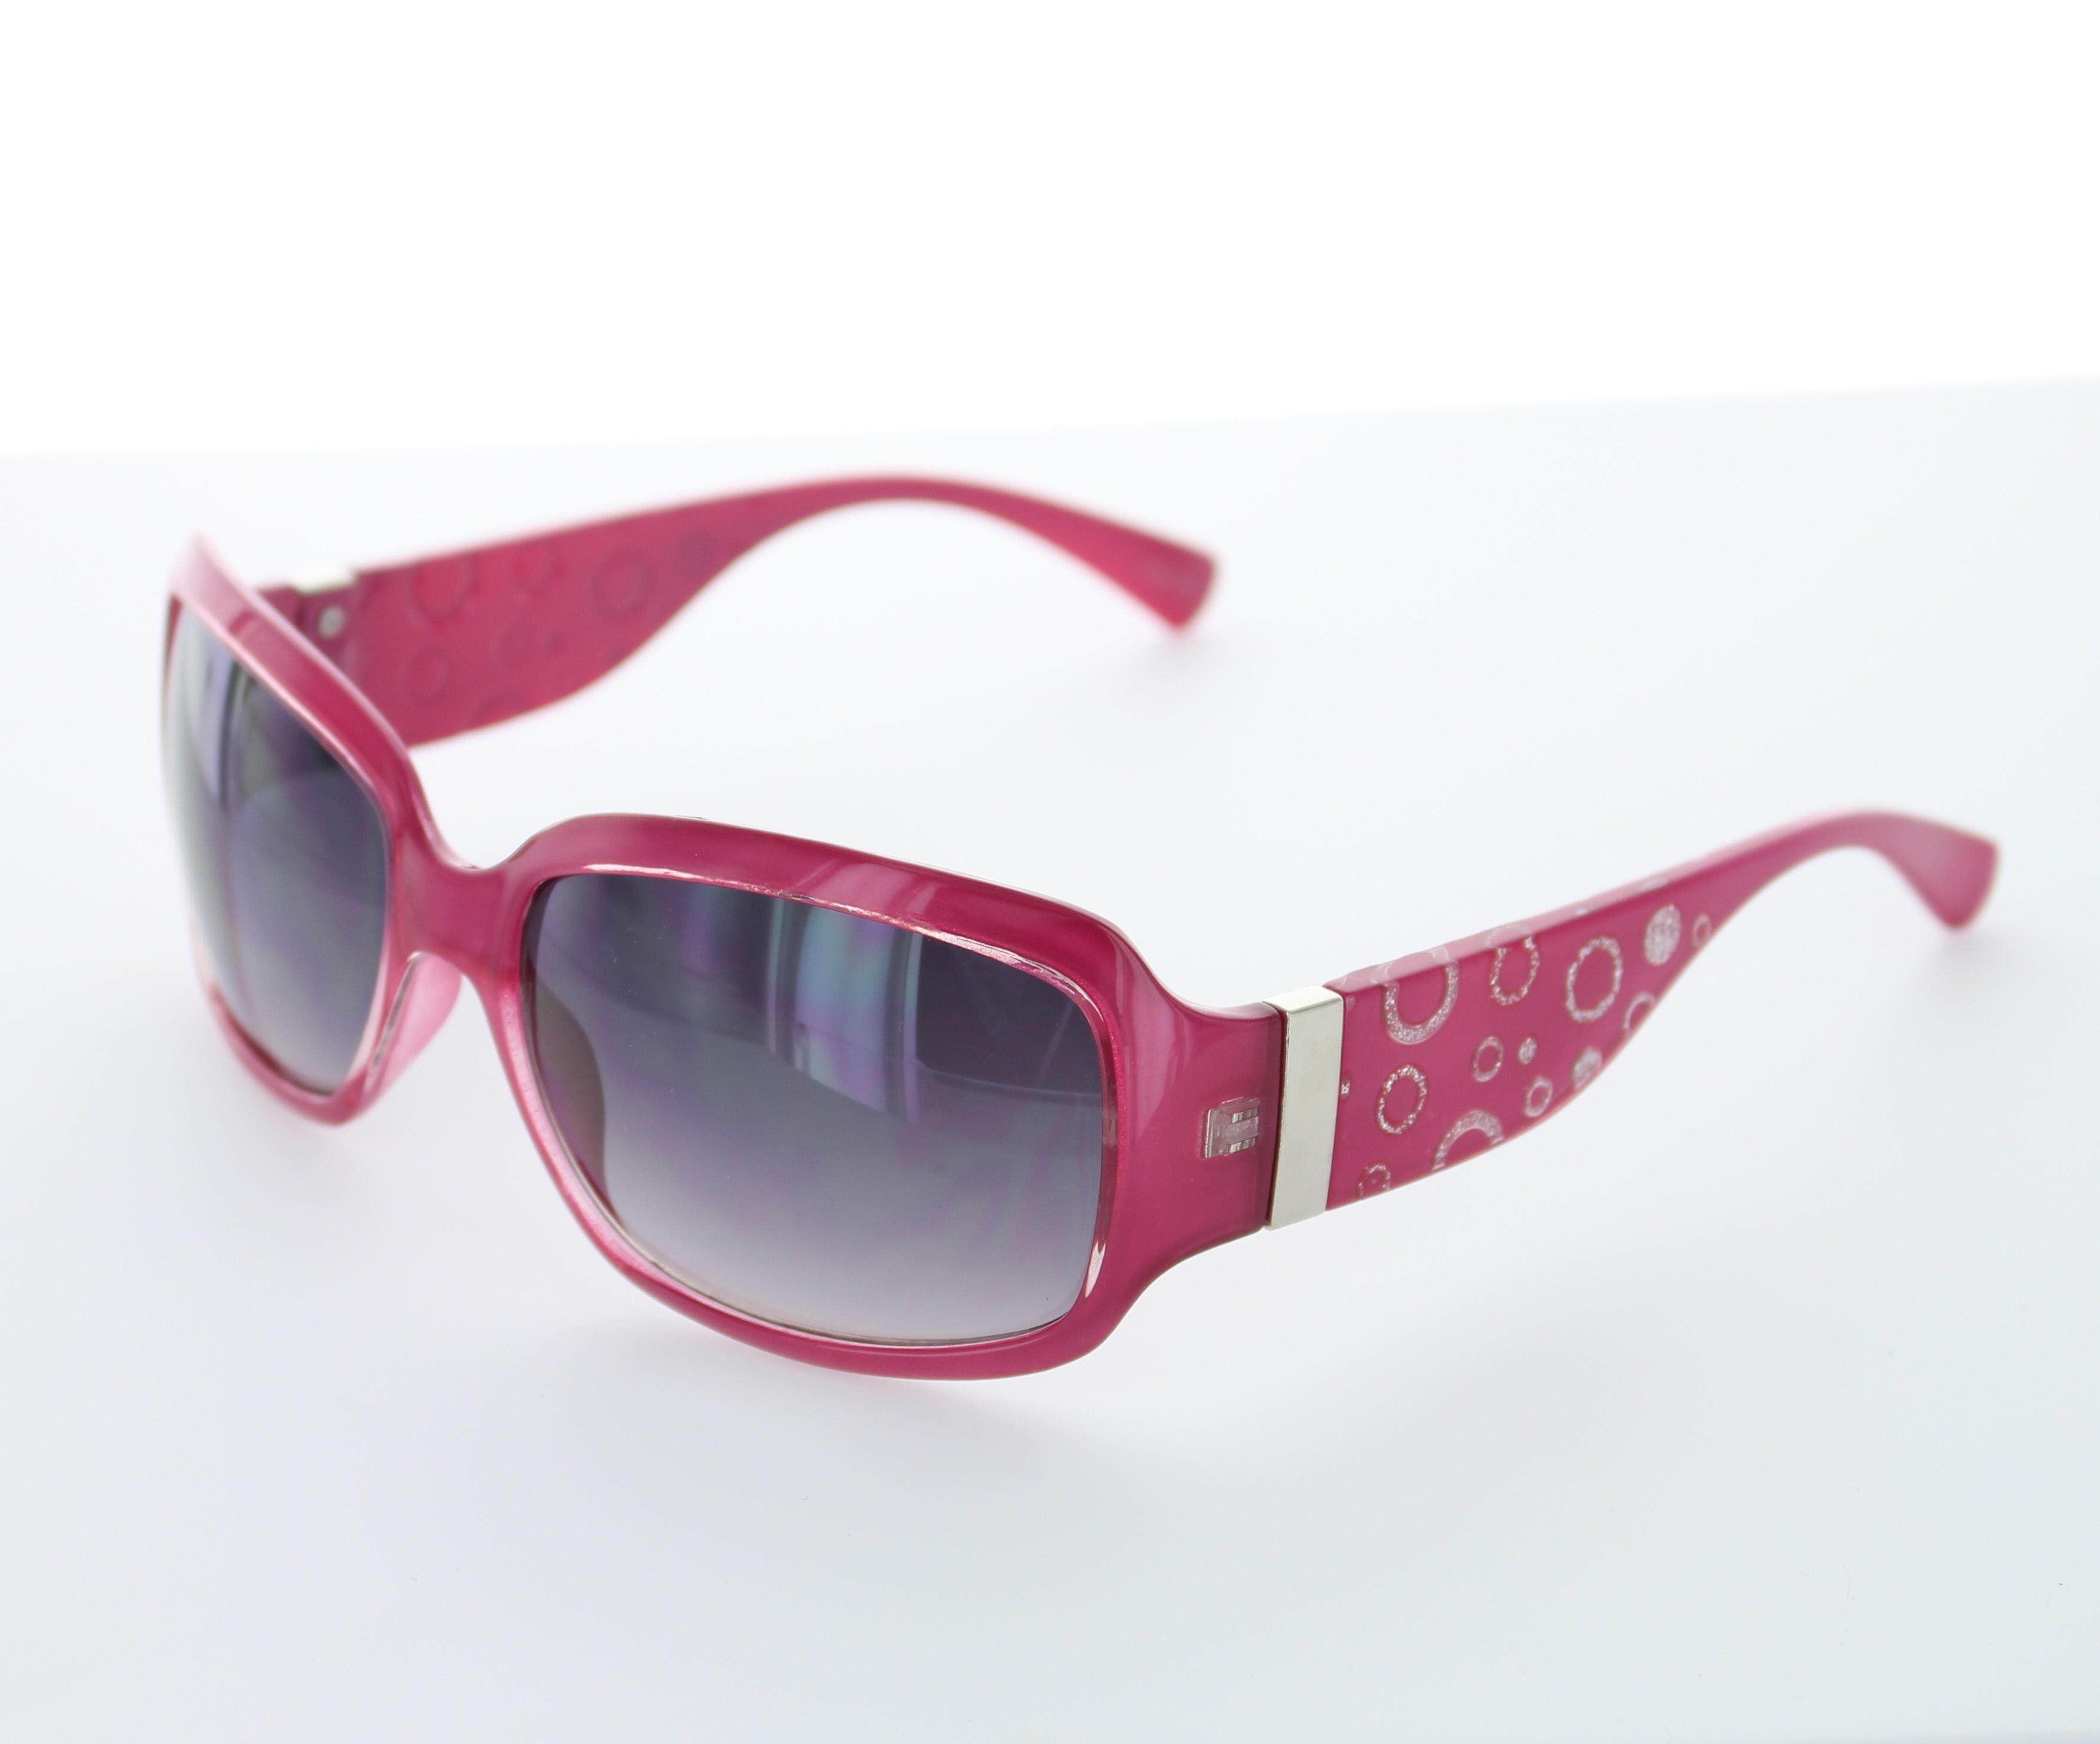 Fashion sunglasses online store 39